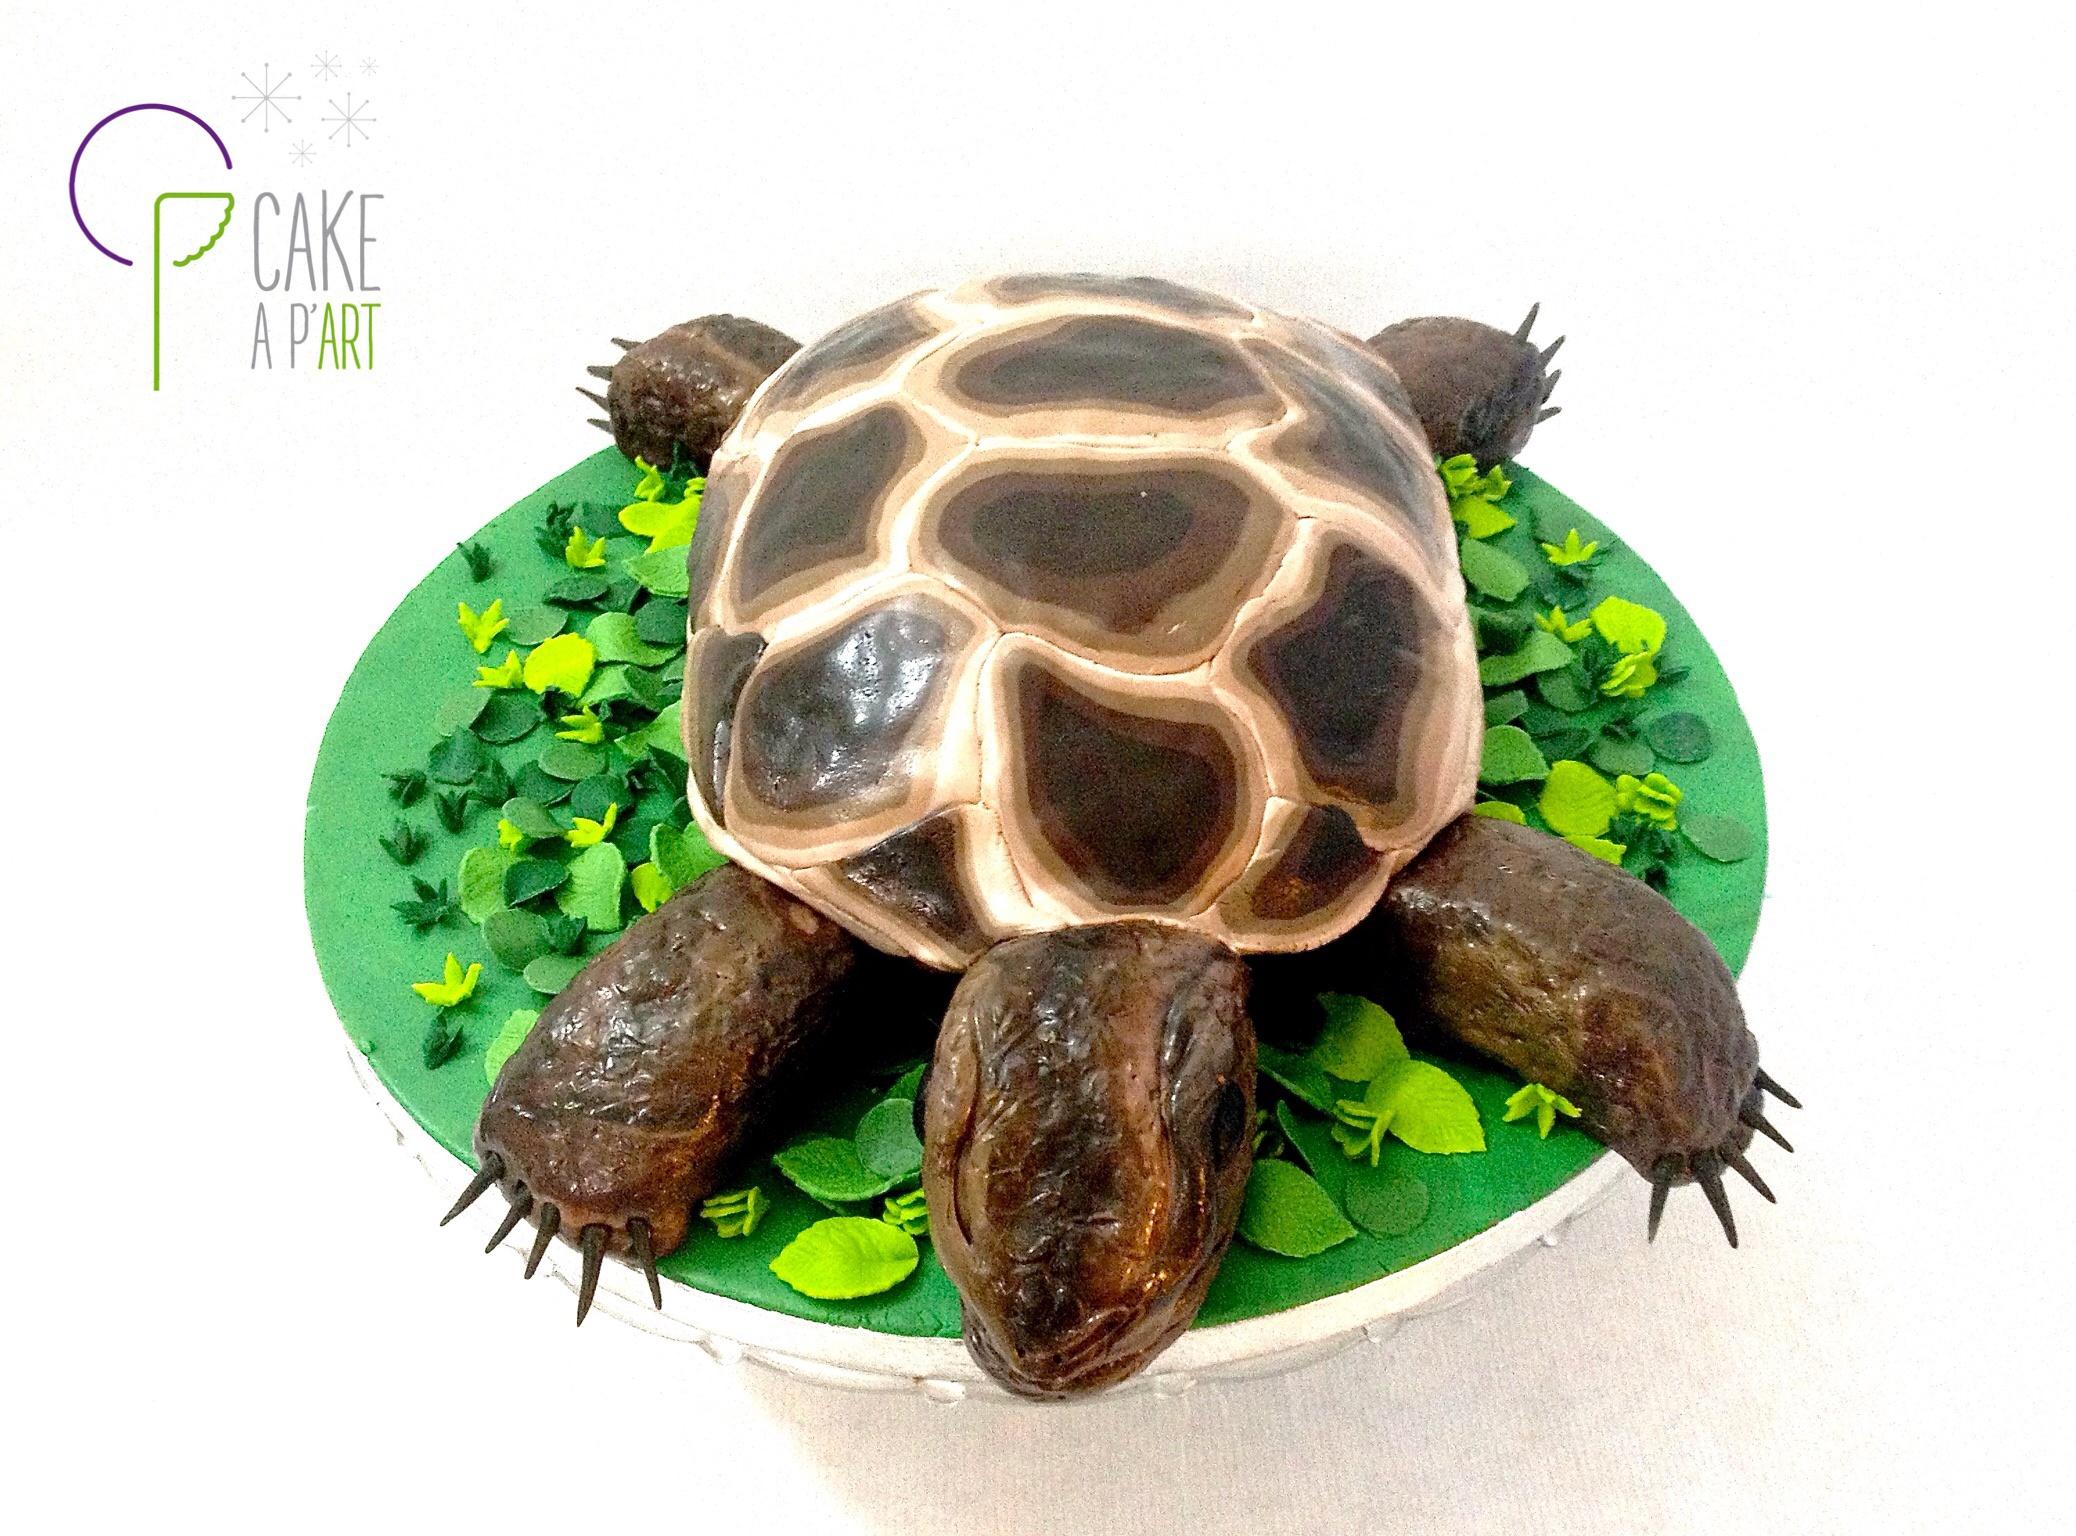 Gâteau sculpté 3D Tortue Cakeapart